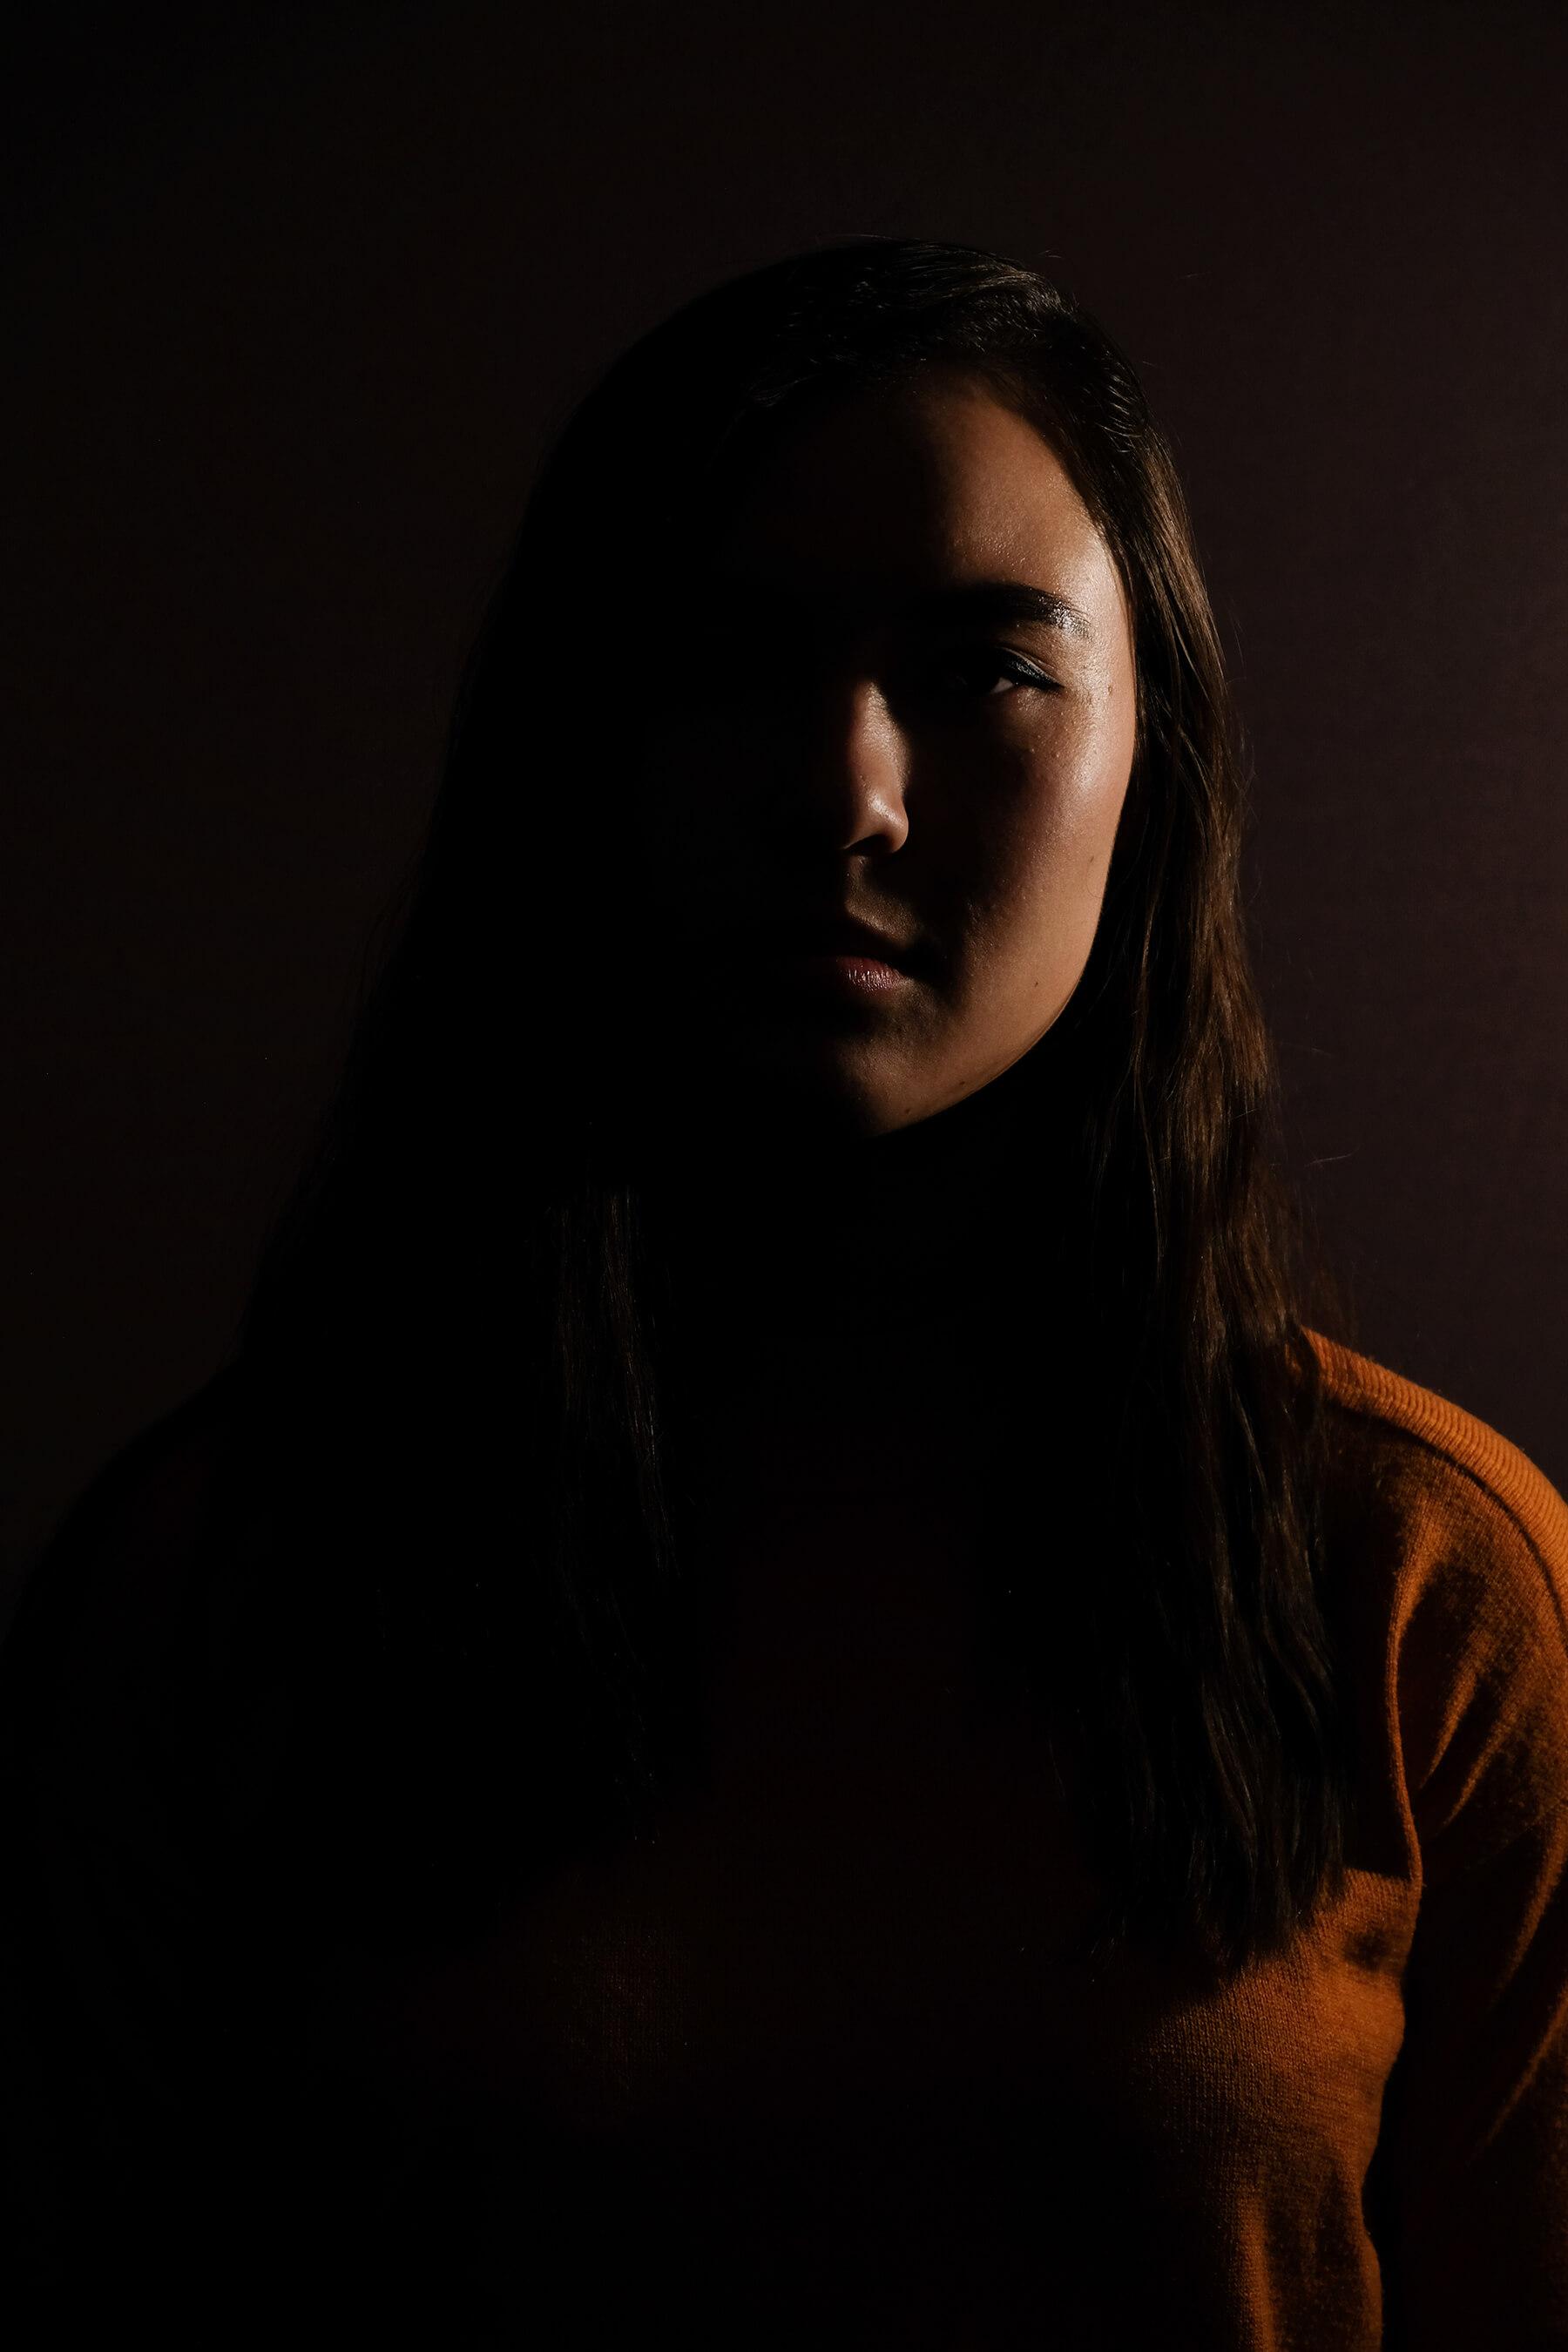 Split lighting portrait